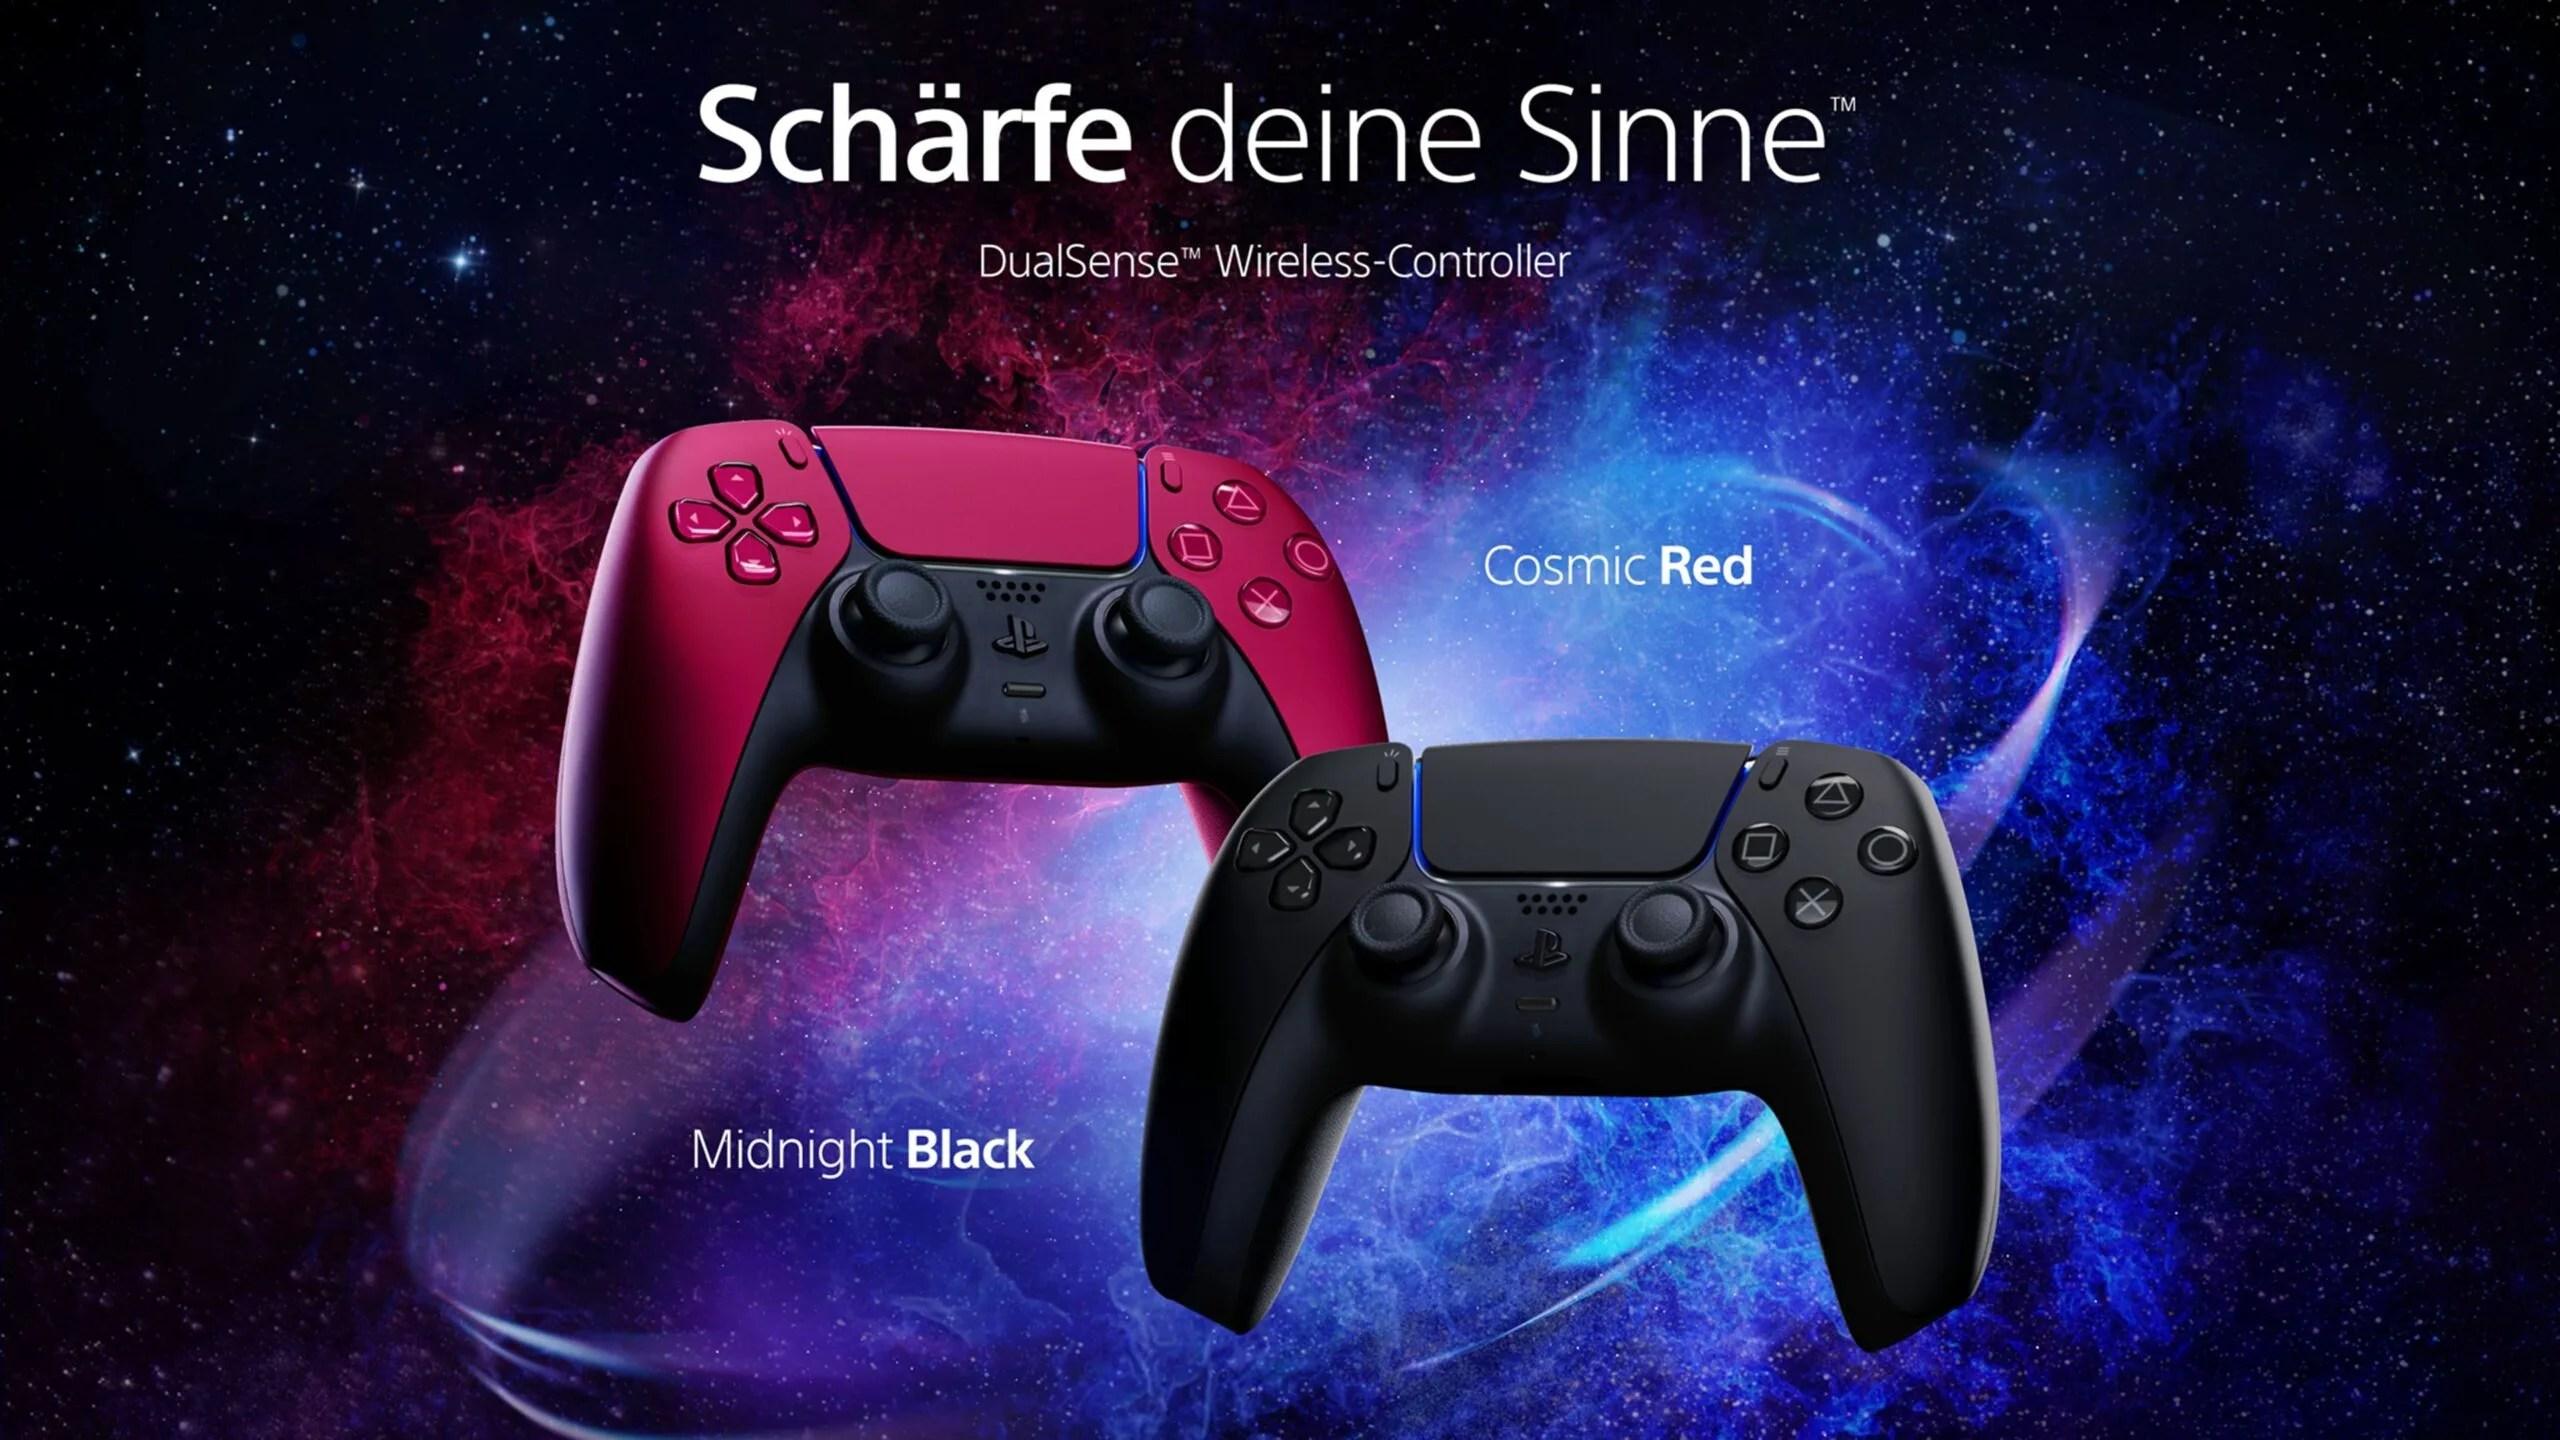 Ps5 Sony Bringt Playstation 5 Controller Jetzt Auch In Schwarz Rot Winfuture De